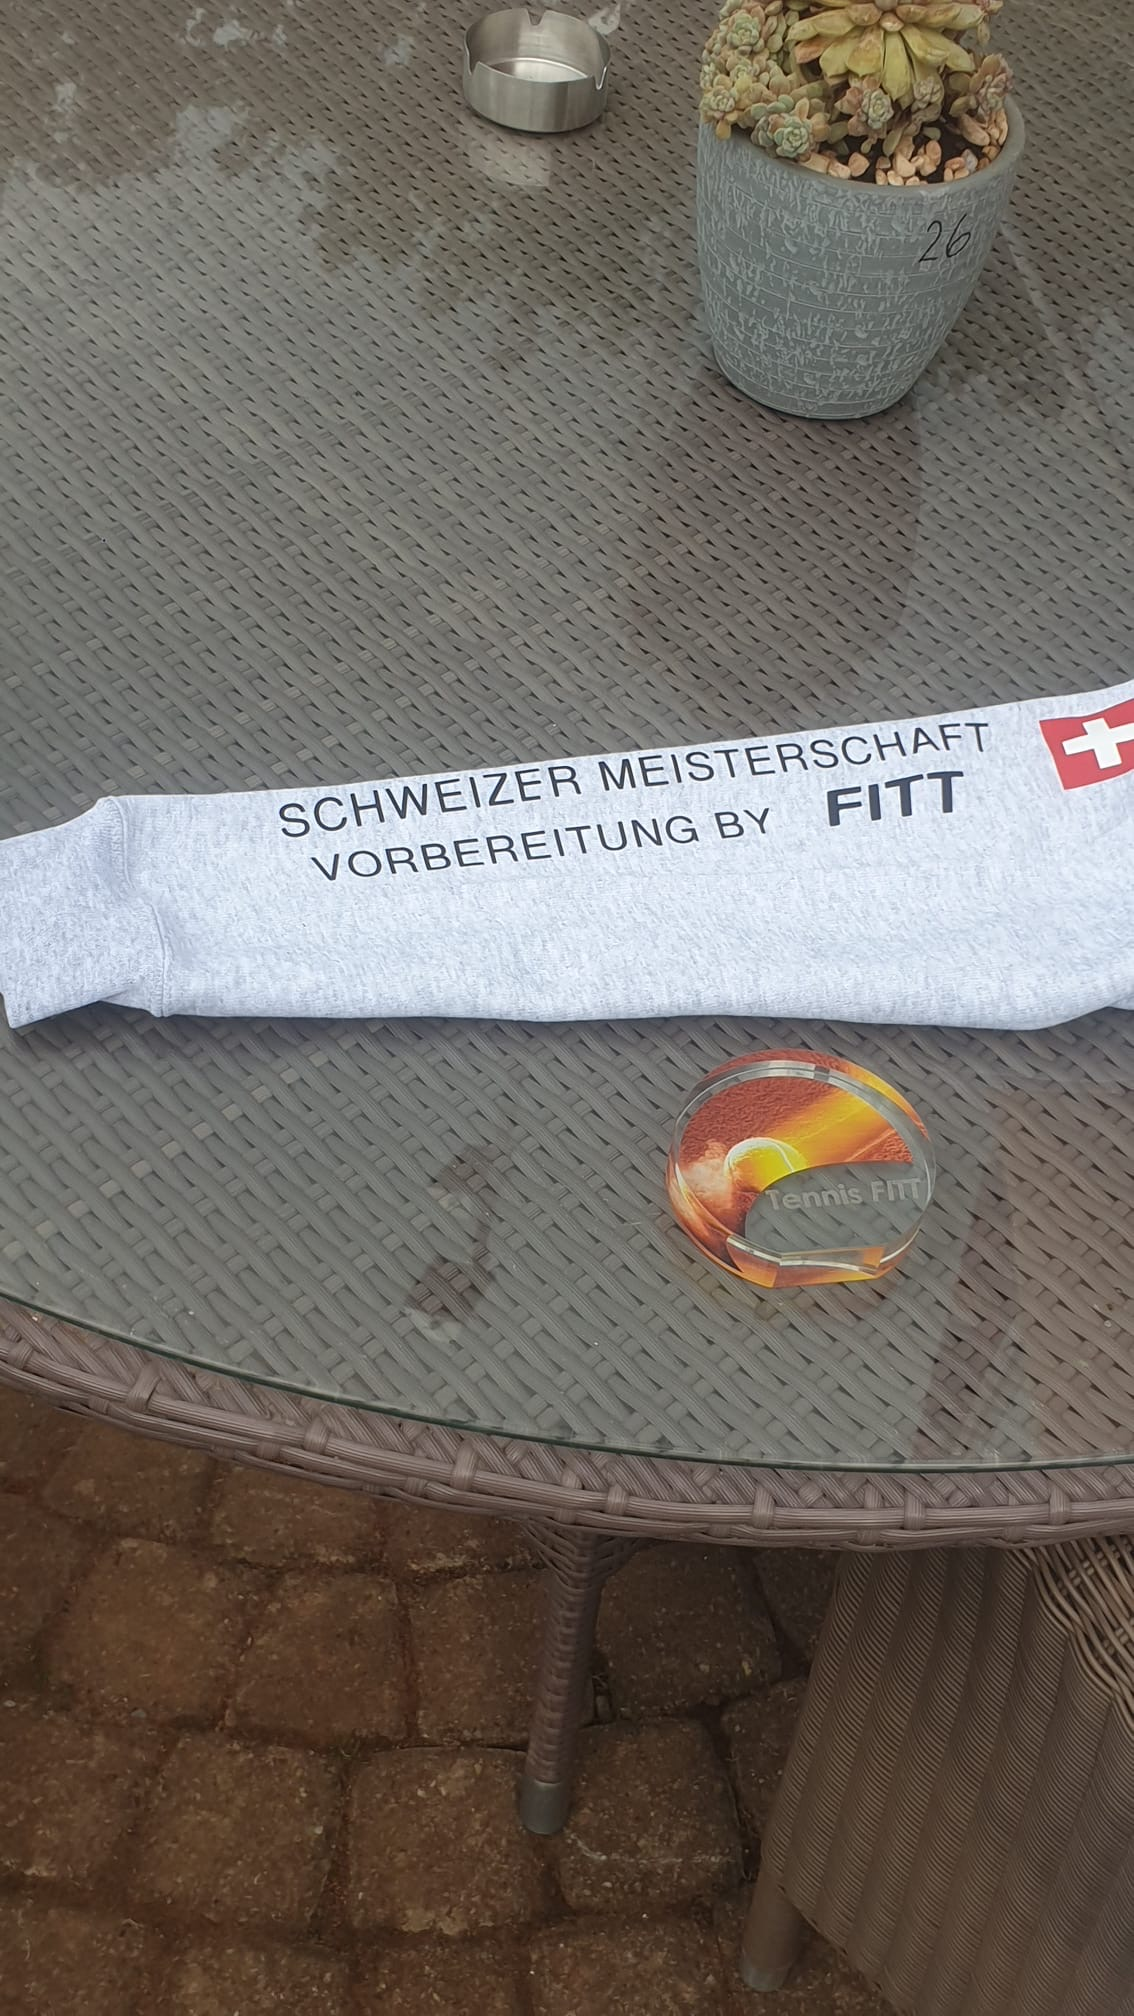 28.06.2020 Azra gewinnt FITT Turnier in Bern